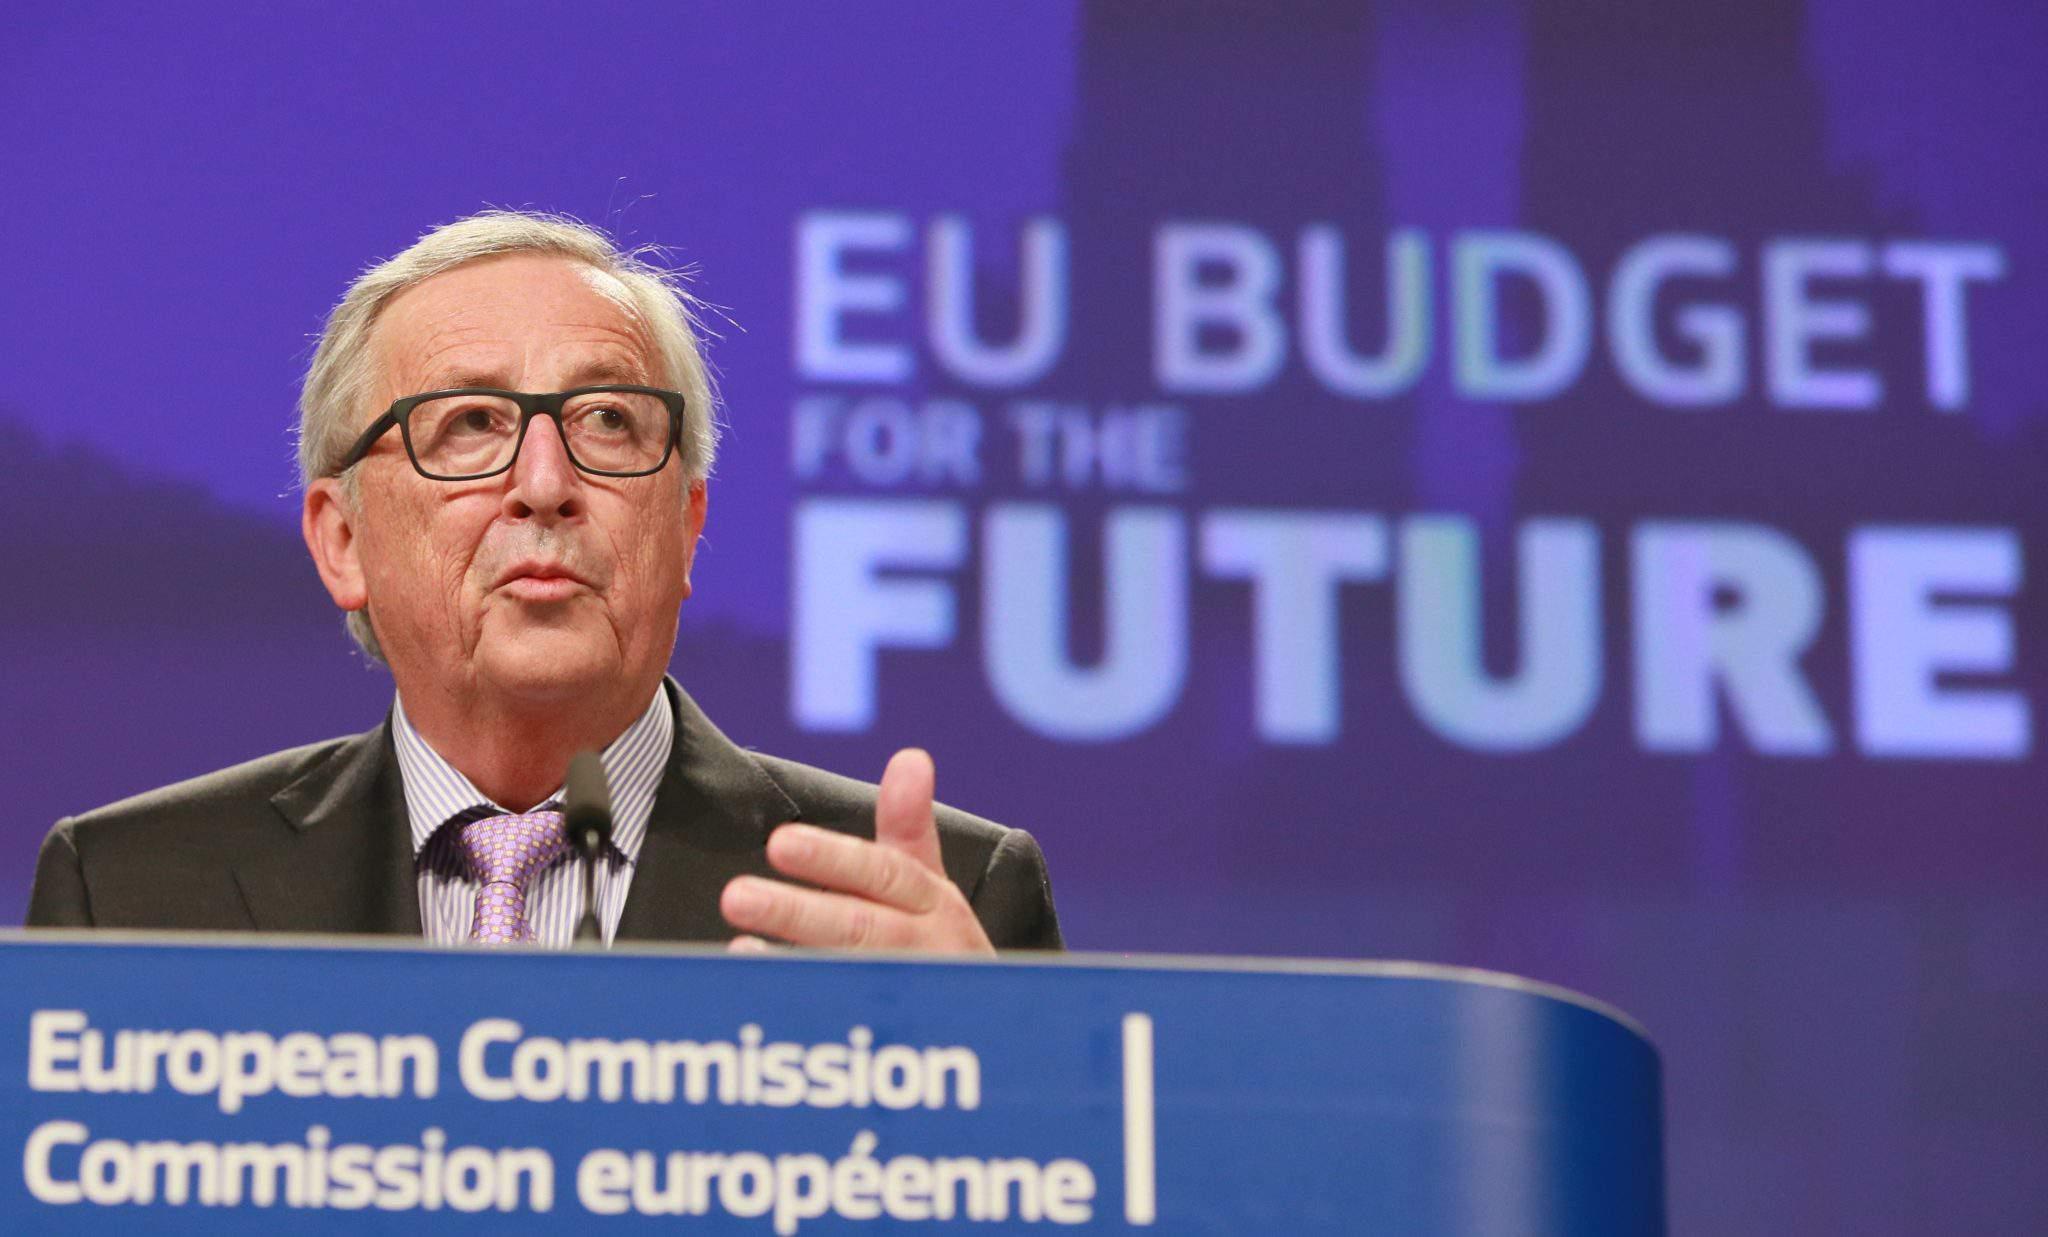 Jean-Clude Juncker EC